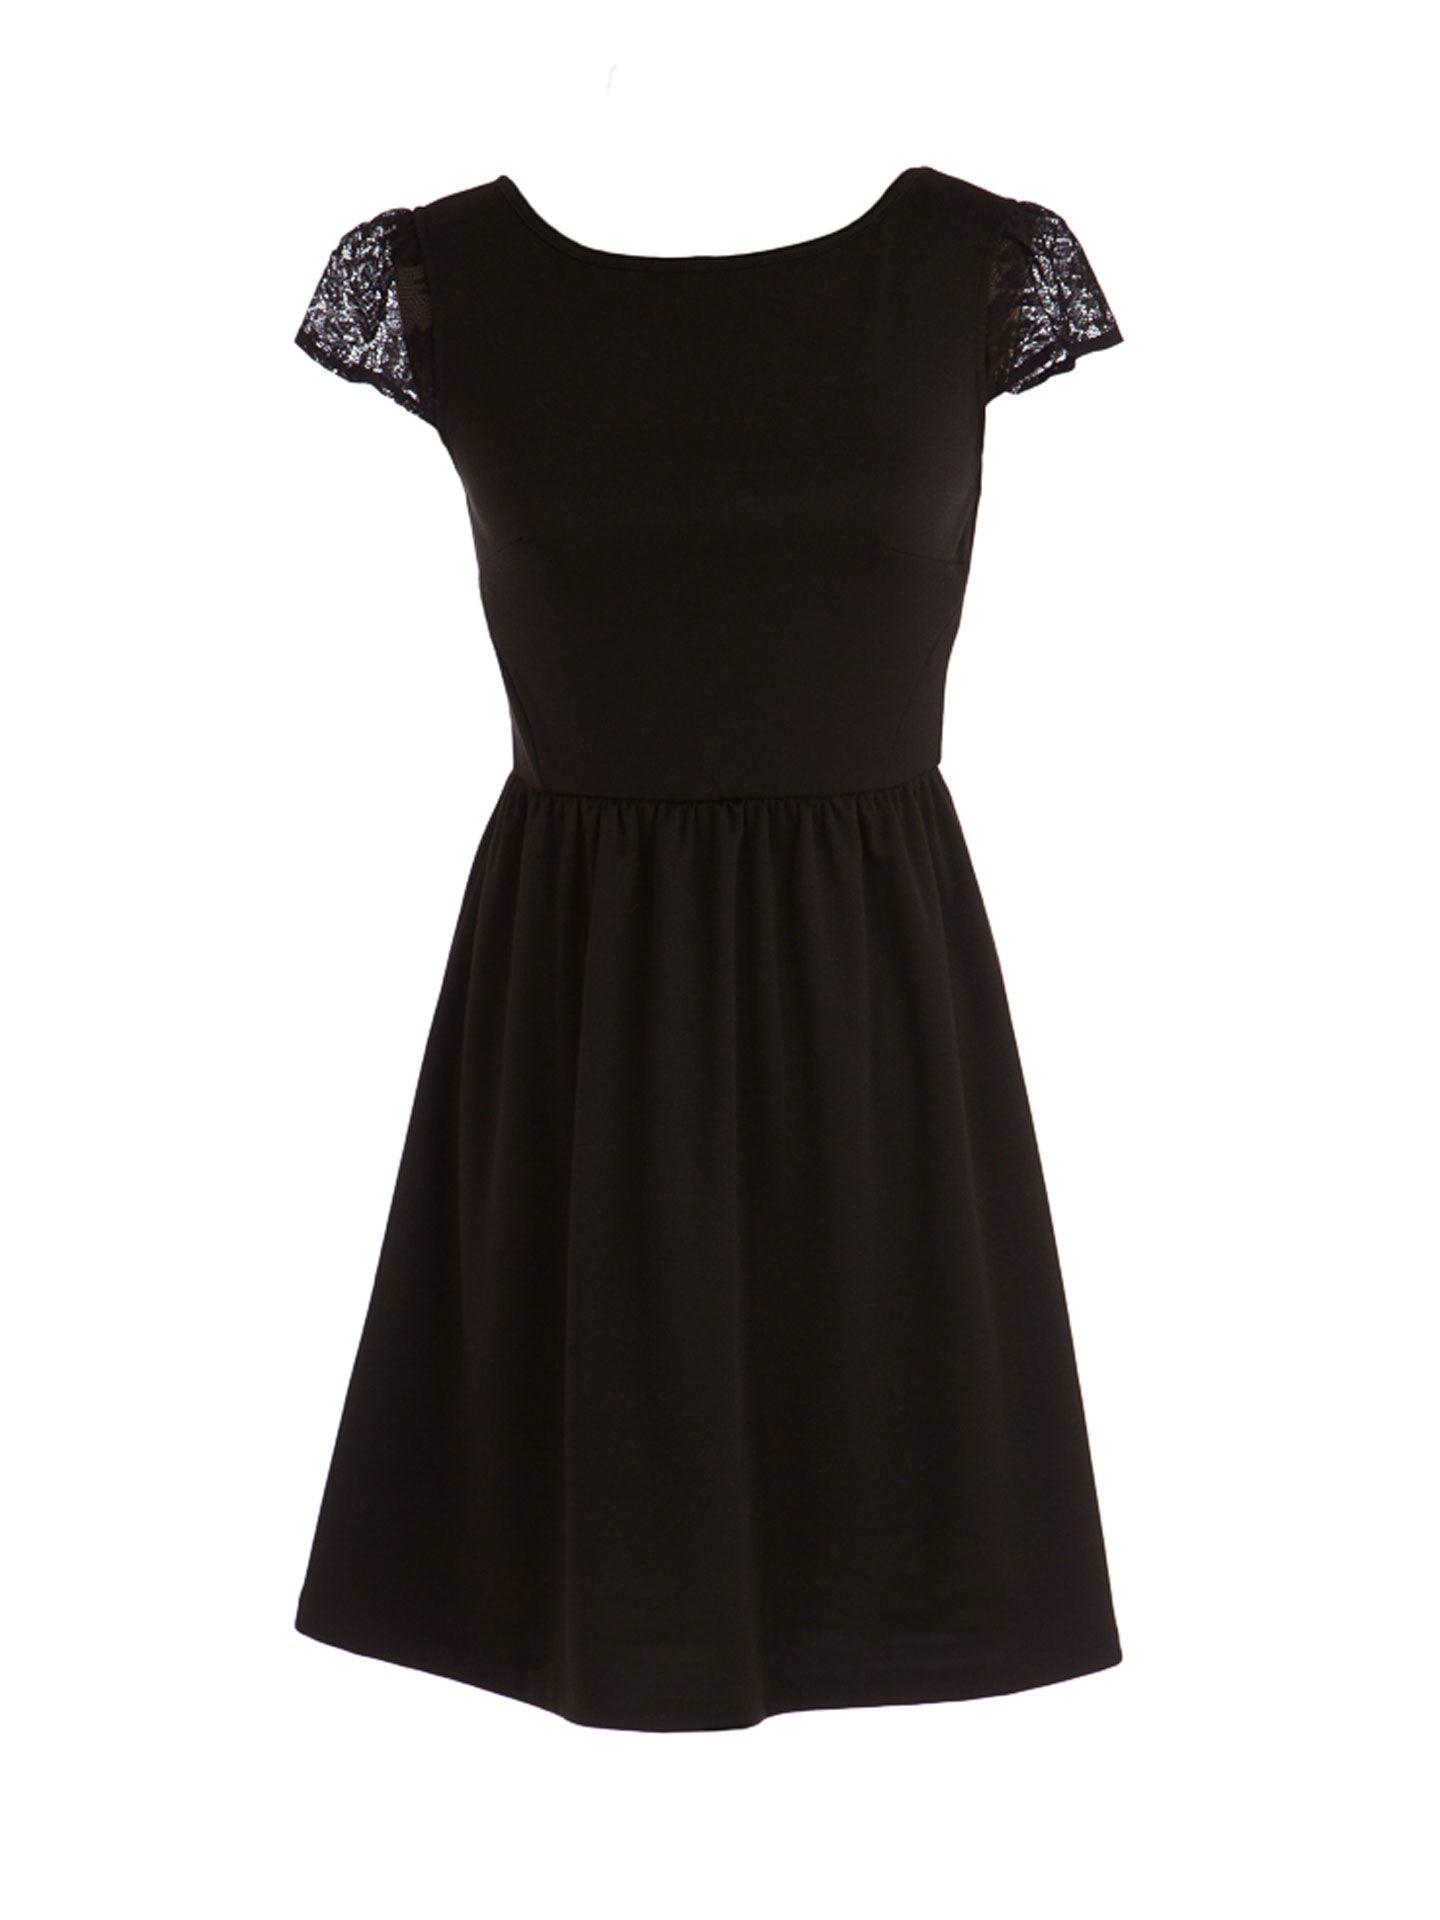 06feab3f7b5d Penny Chic by Shauna Miller Women s Skater Little Black Dress